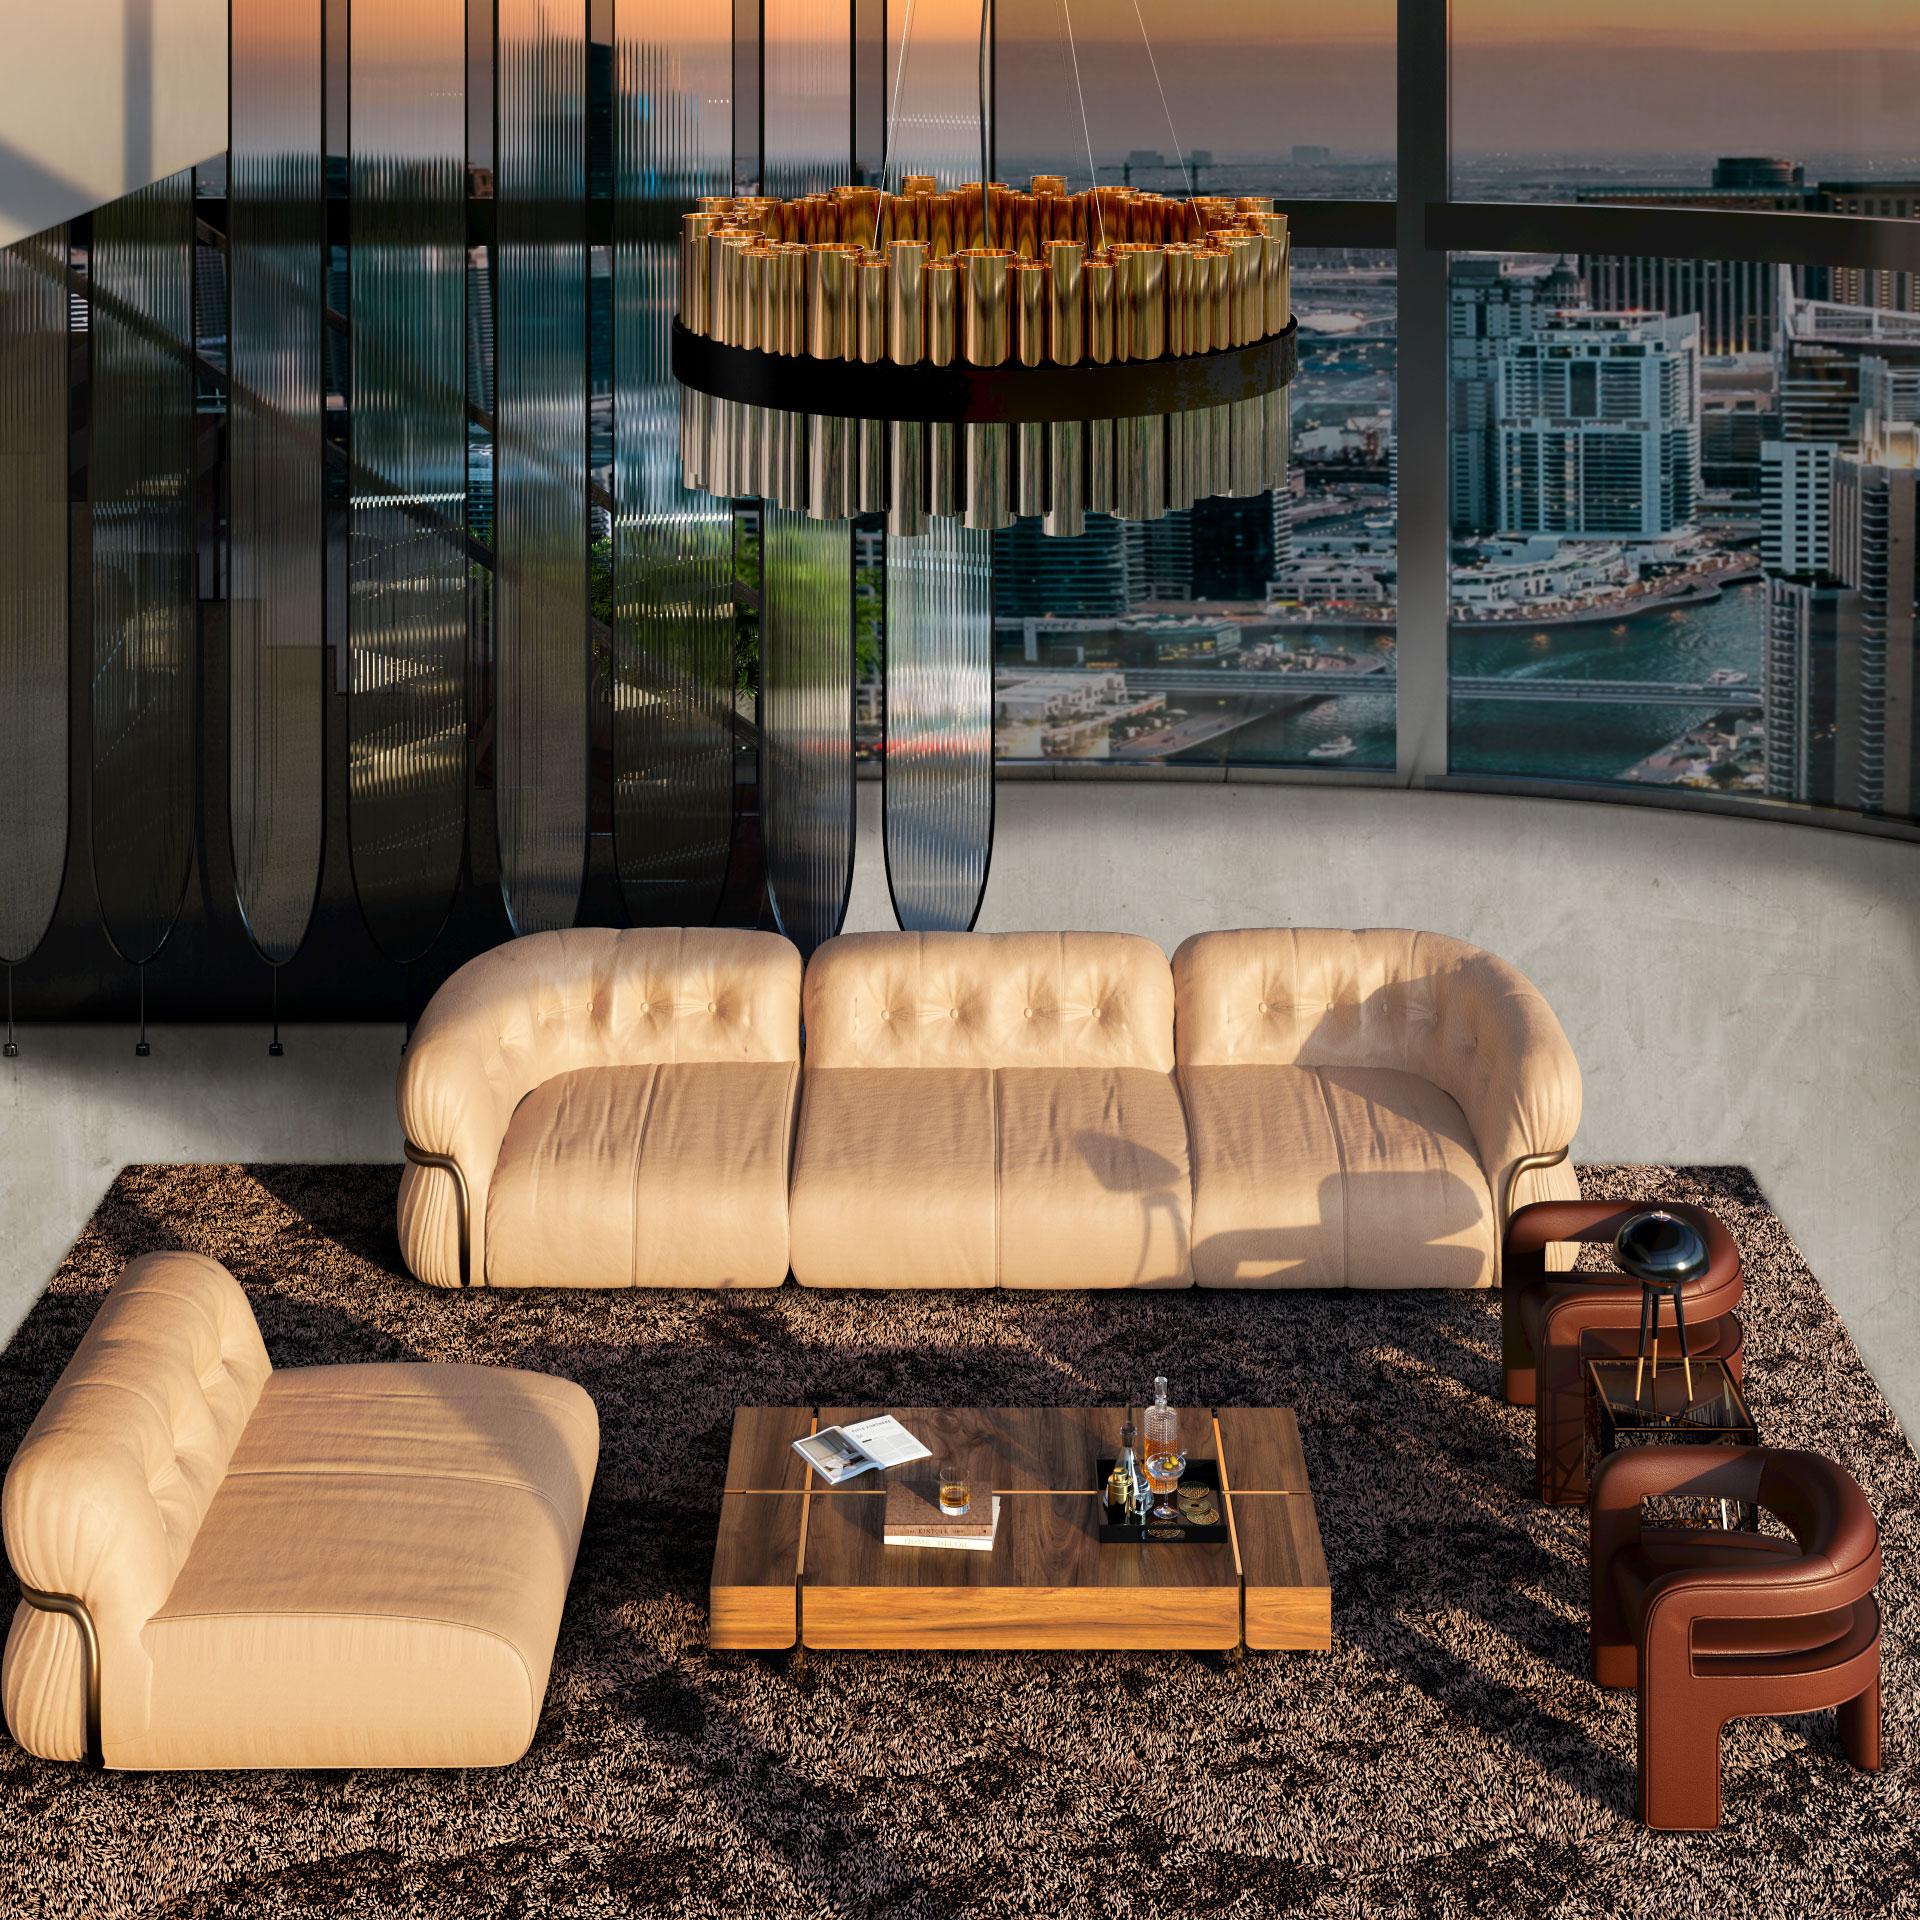 Joshua modular sofa